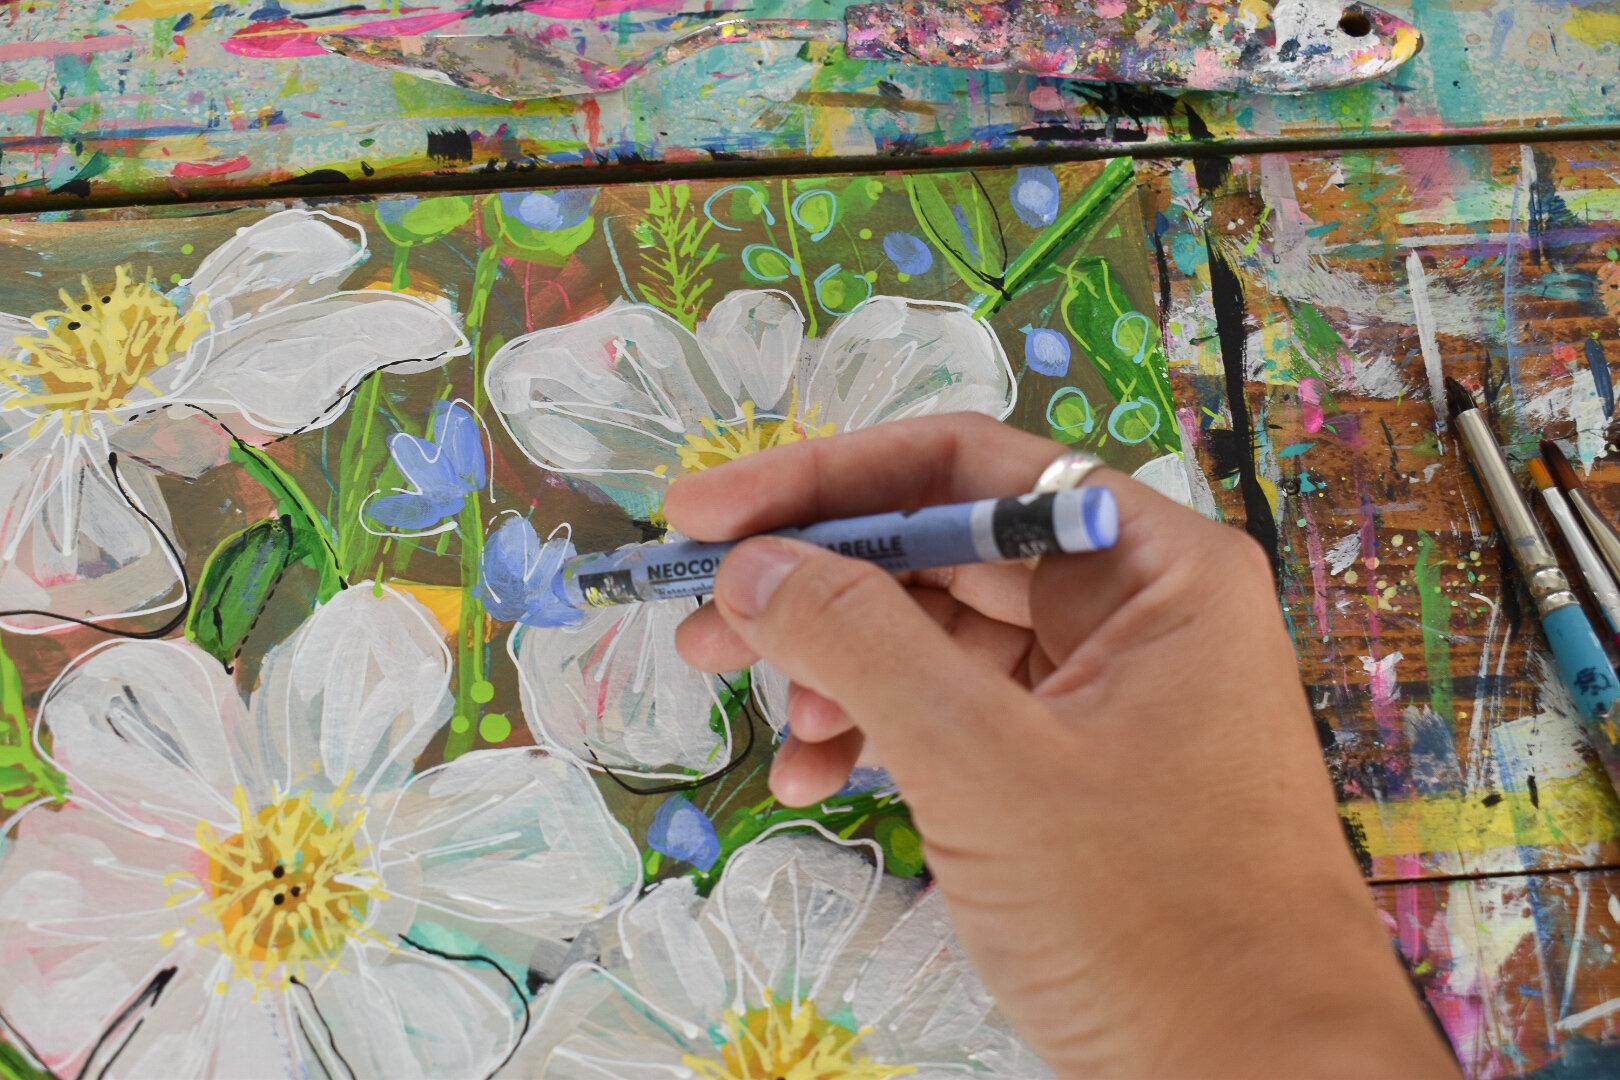 boho_painting_art_poppies_daisyfaithart_5.jpg